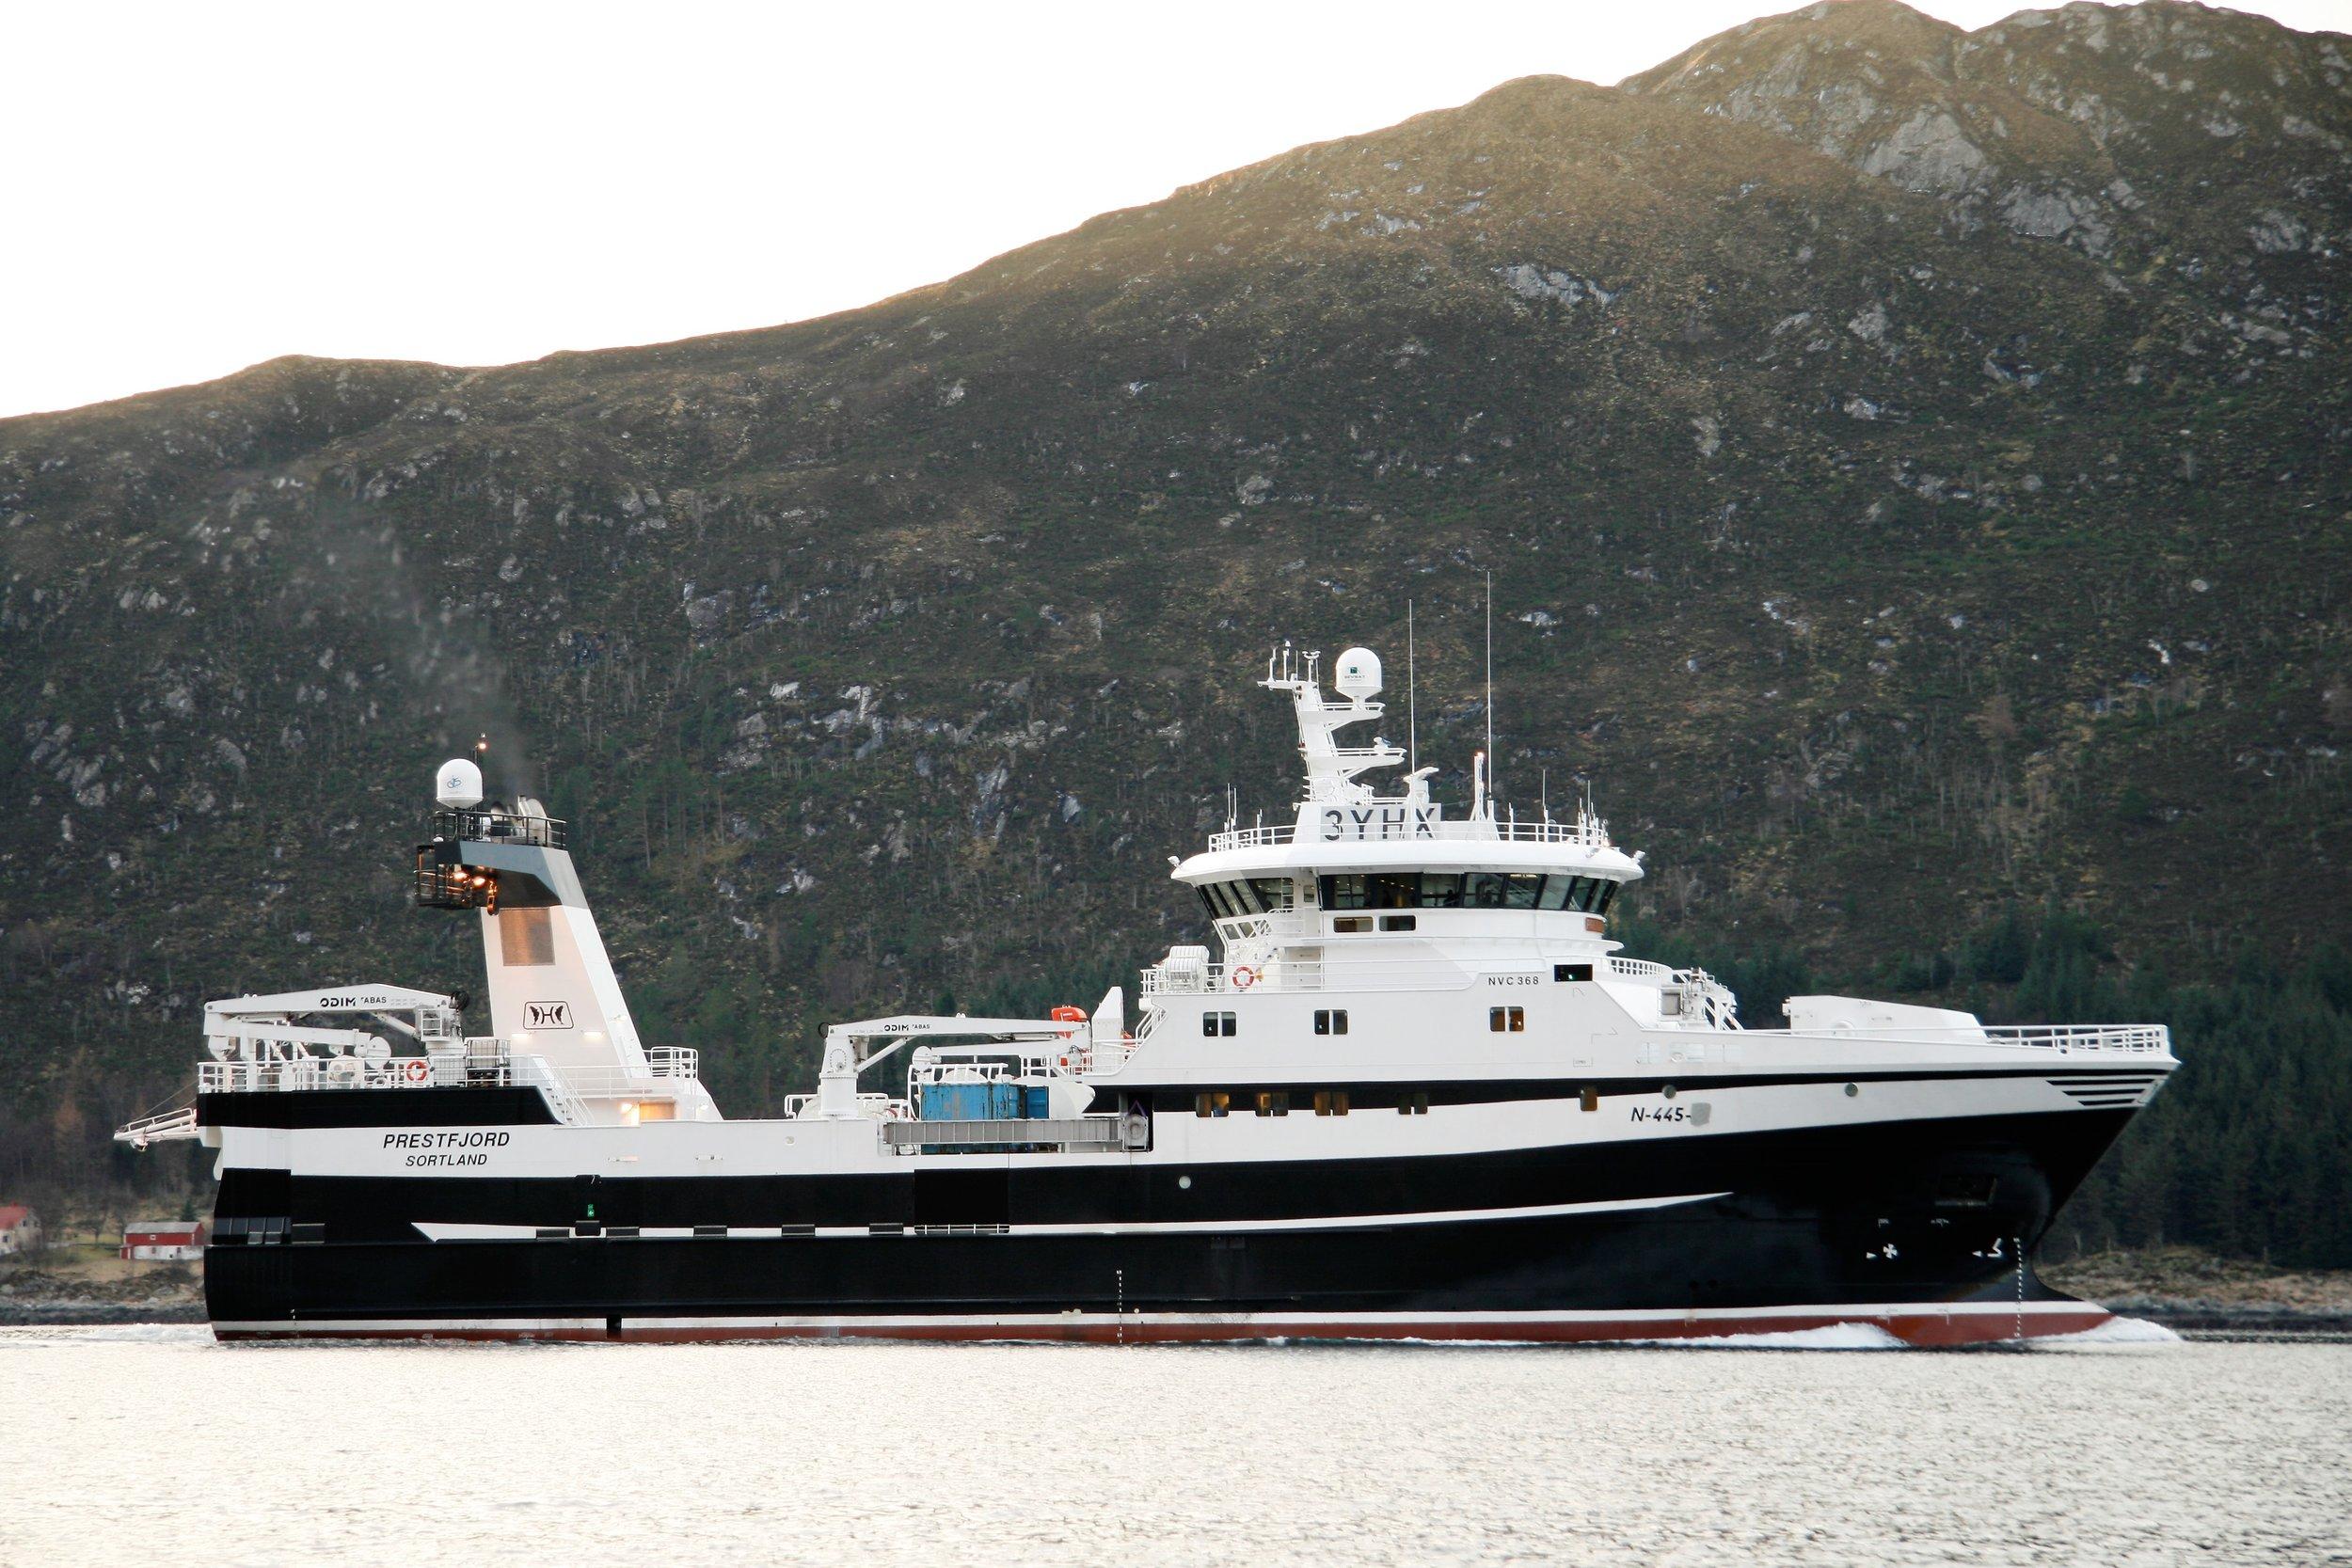 Bn 343 Prestfjord.jpg